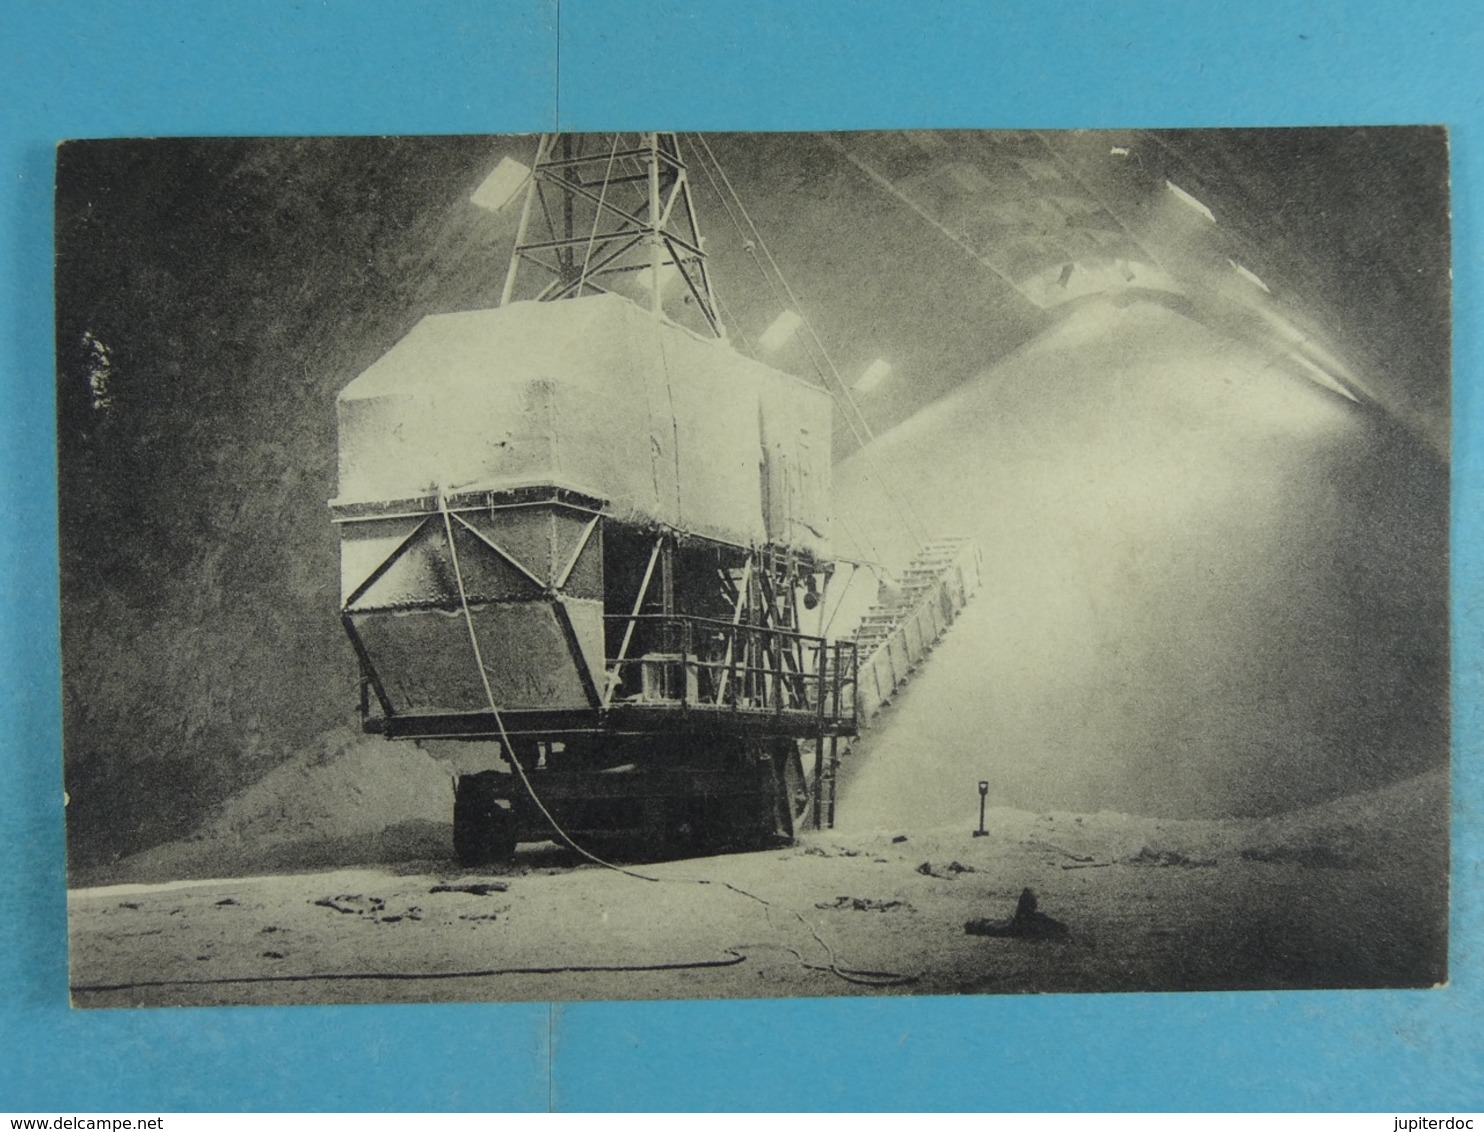 Willebroek Fabrieken Ammoniaque Synthétique & Dérivés Vue Intérieure Des Silos - Willebroek